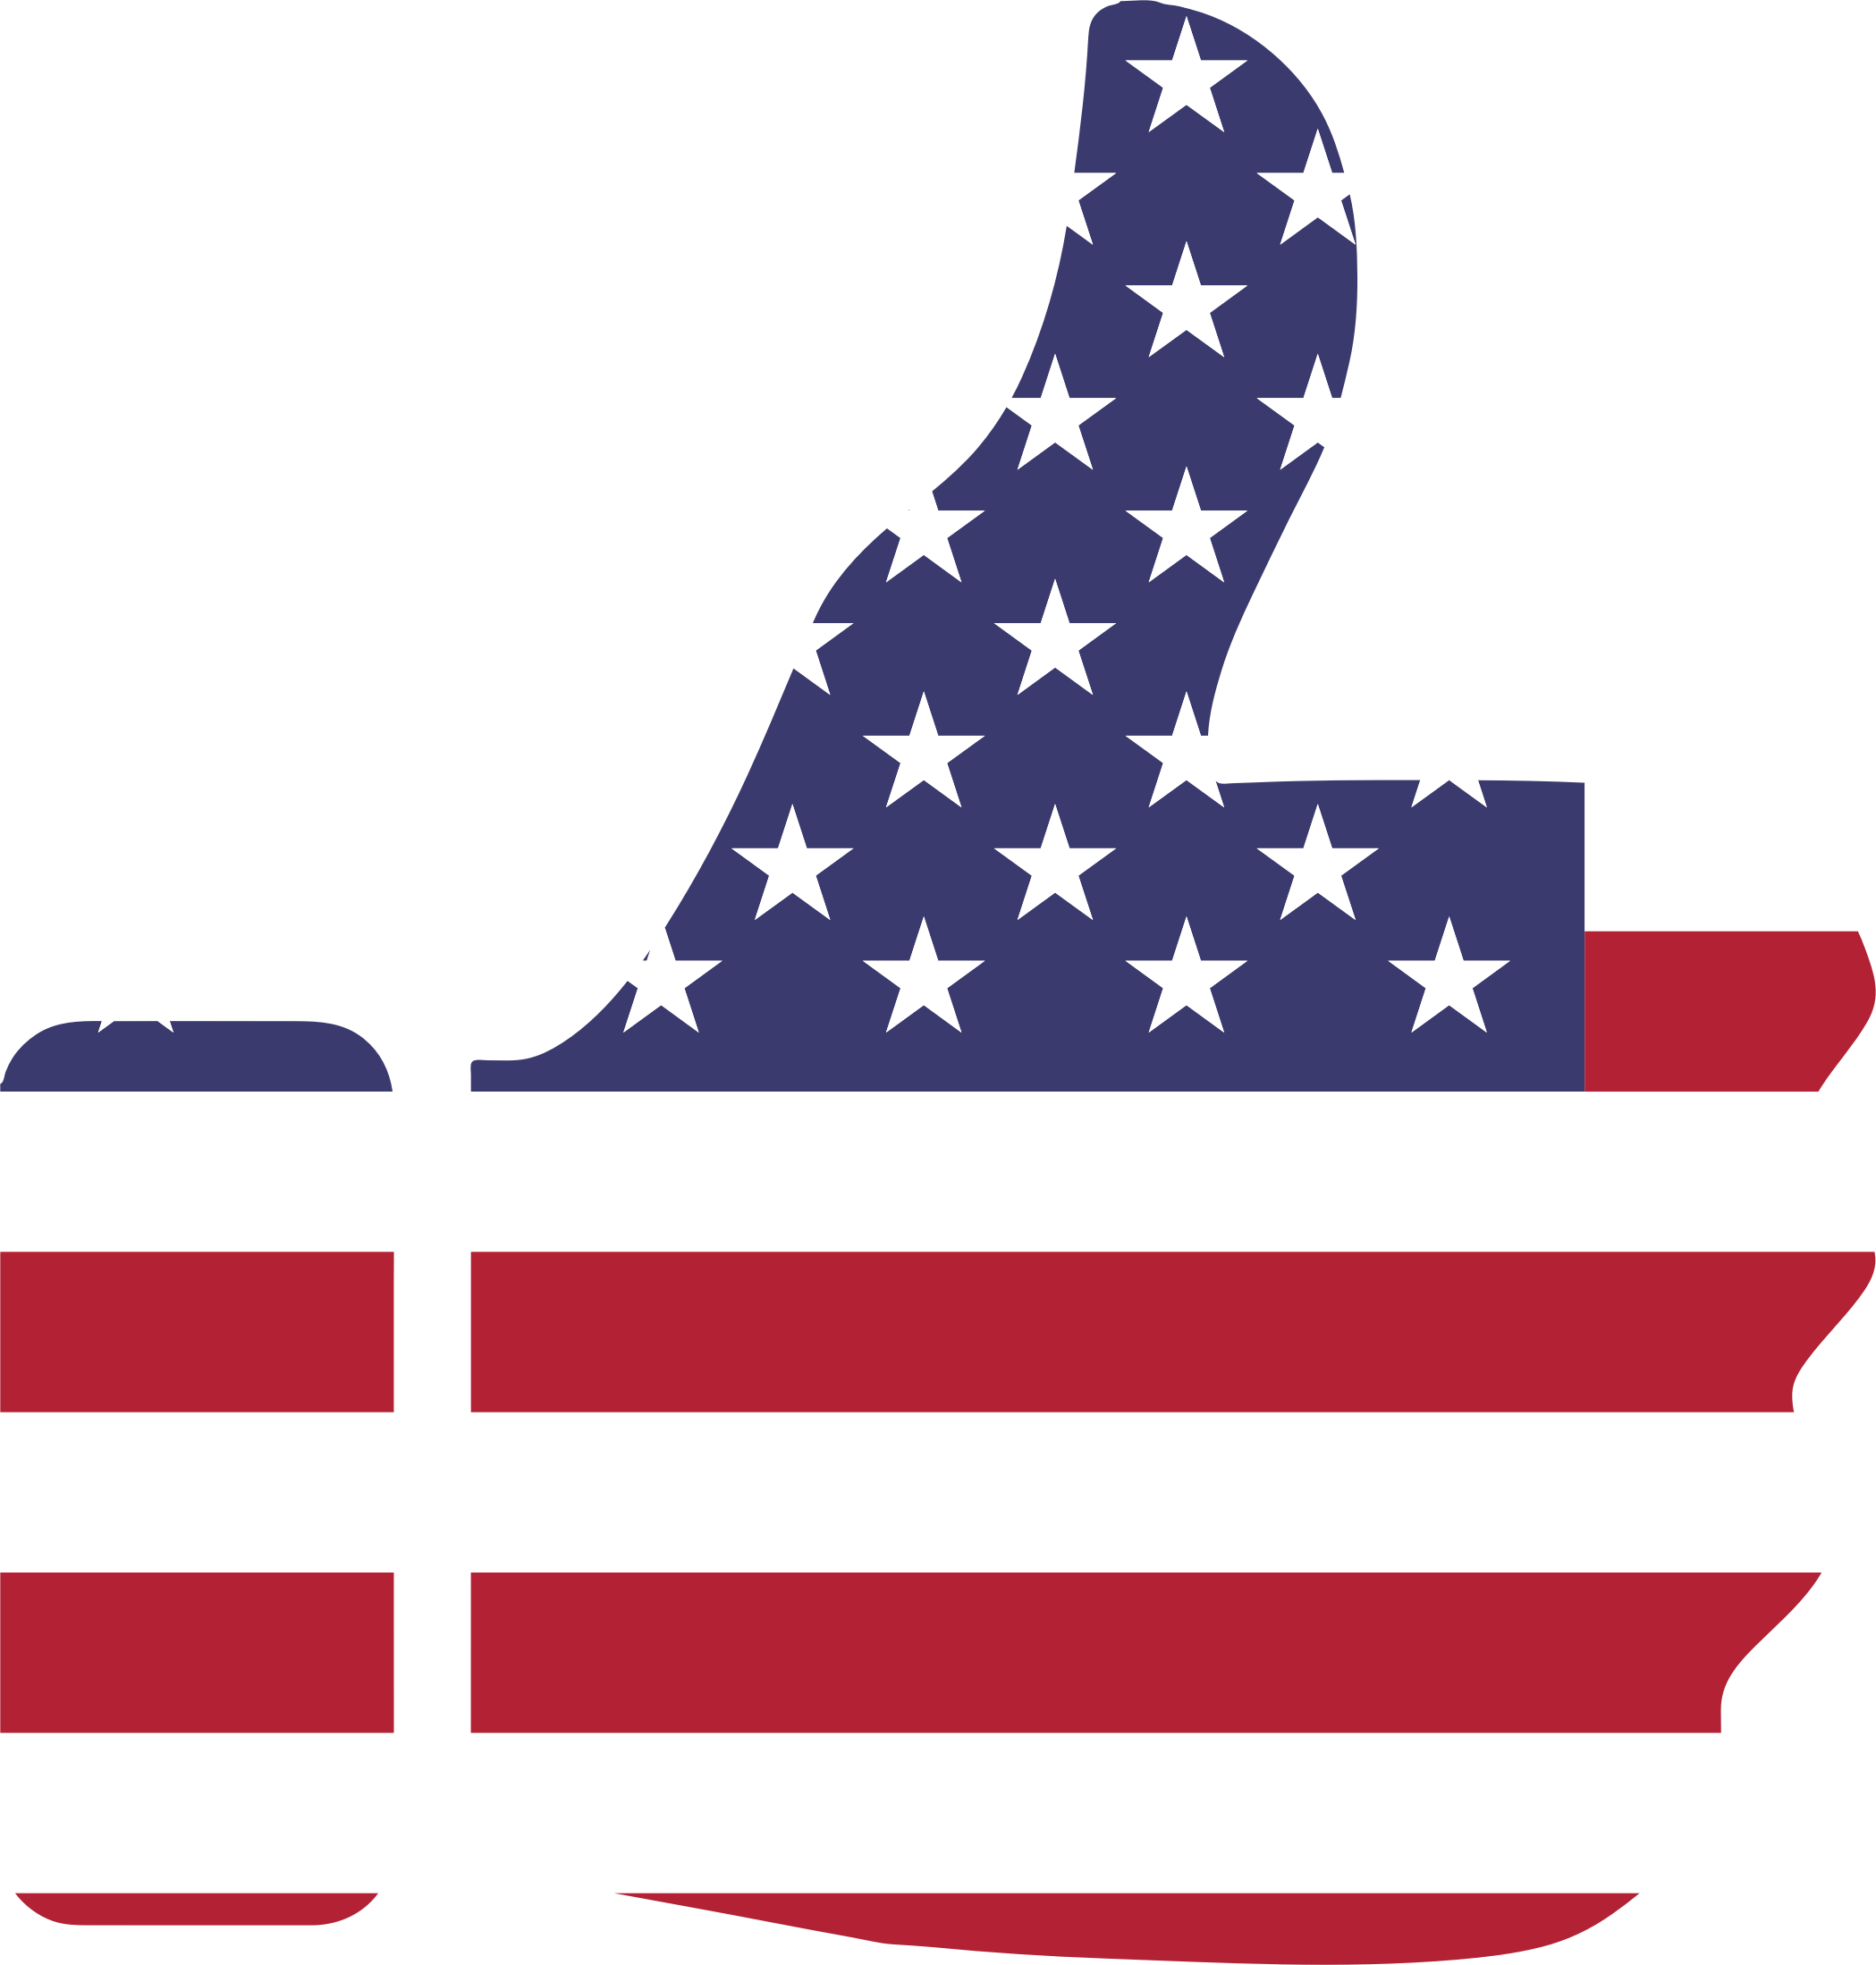 Thumb Up American Flag transparent PNG.